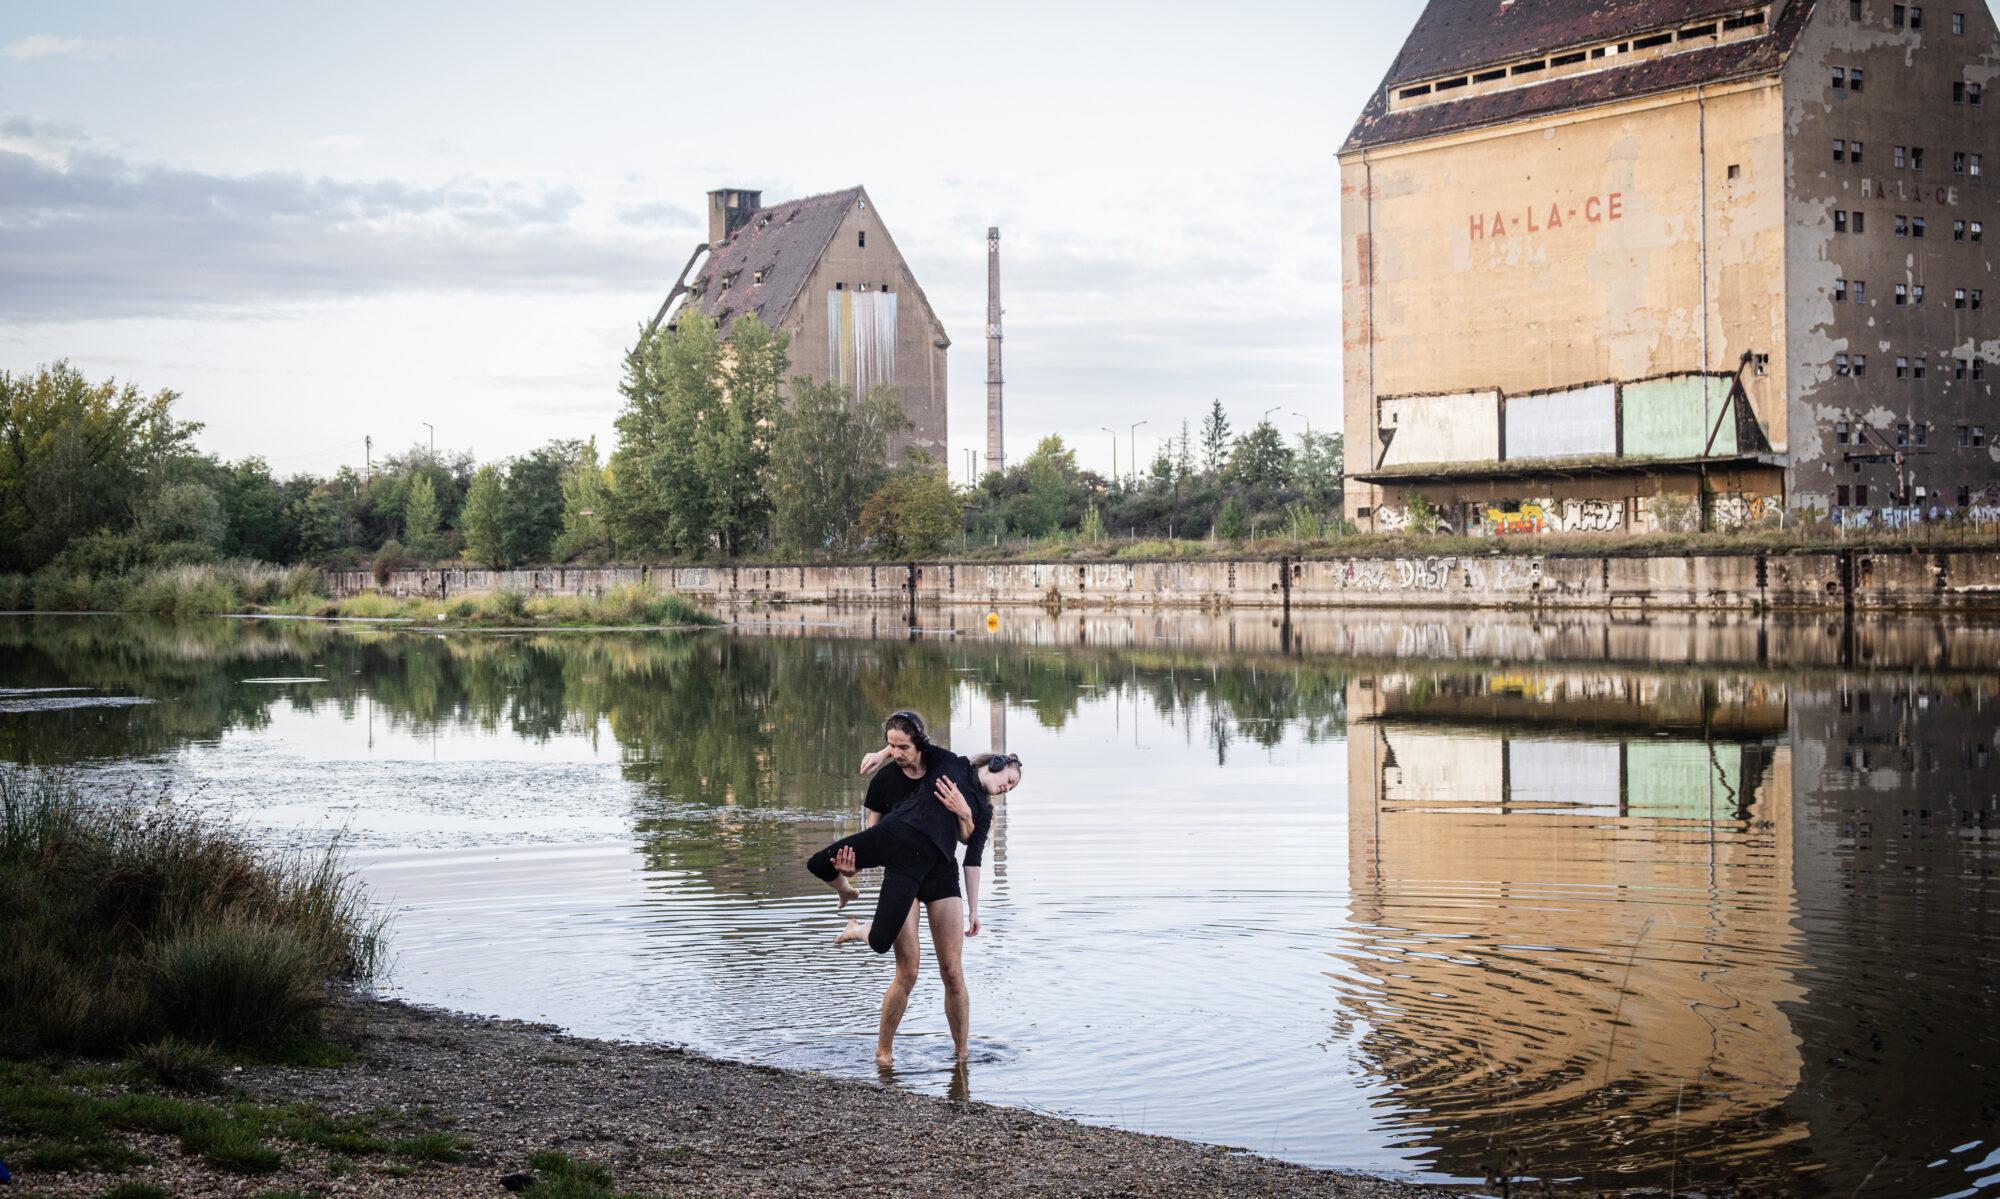 Kulturkosmos Leipzig